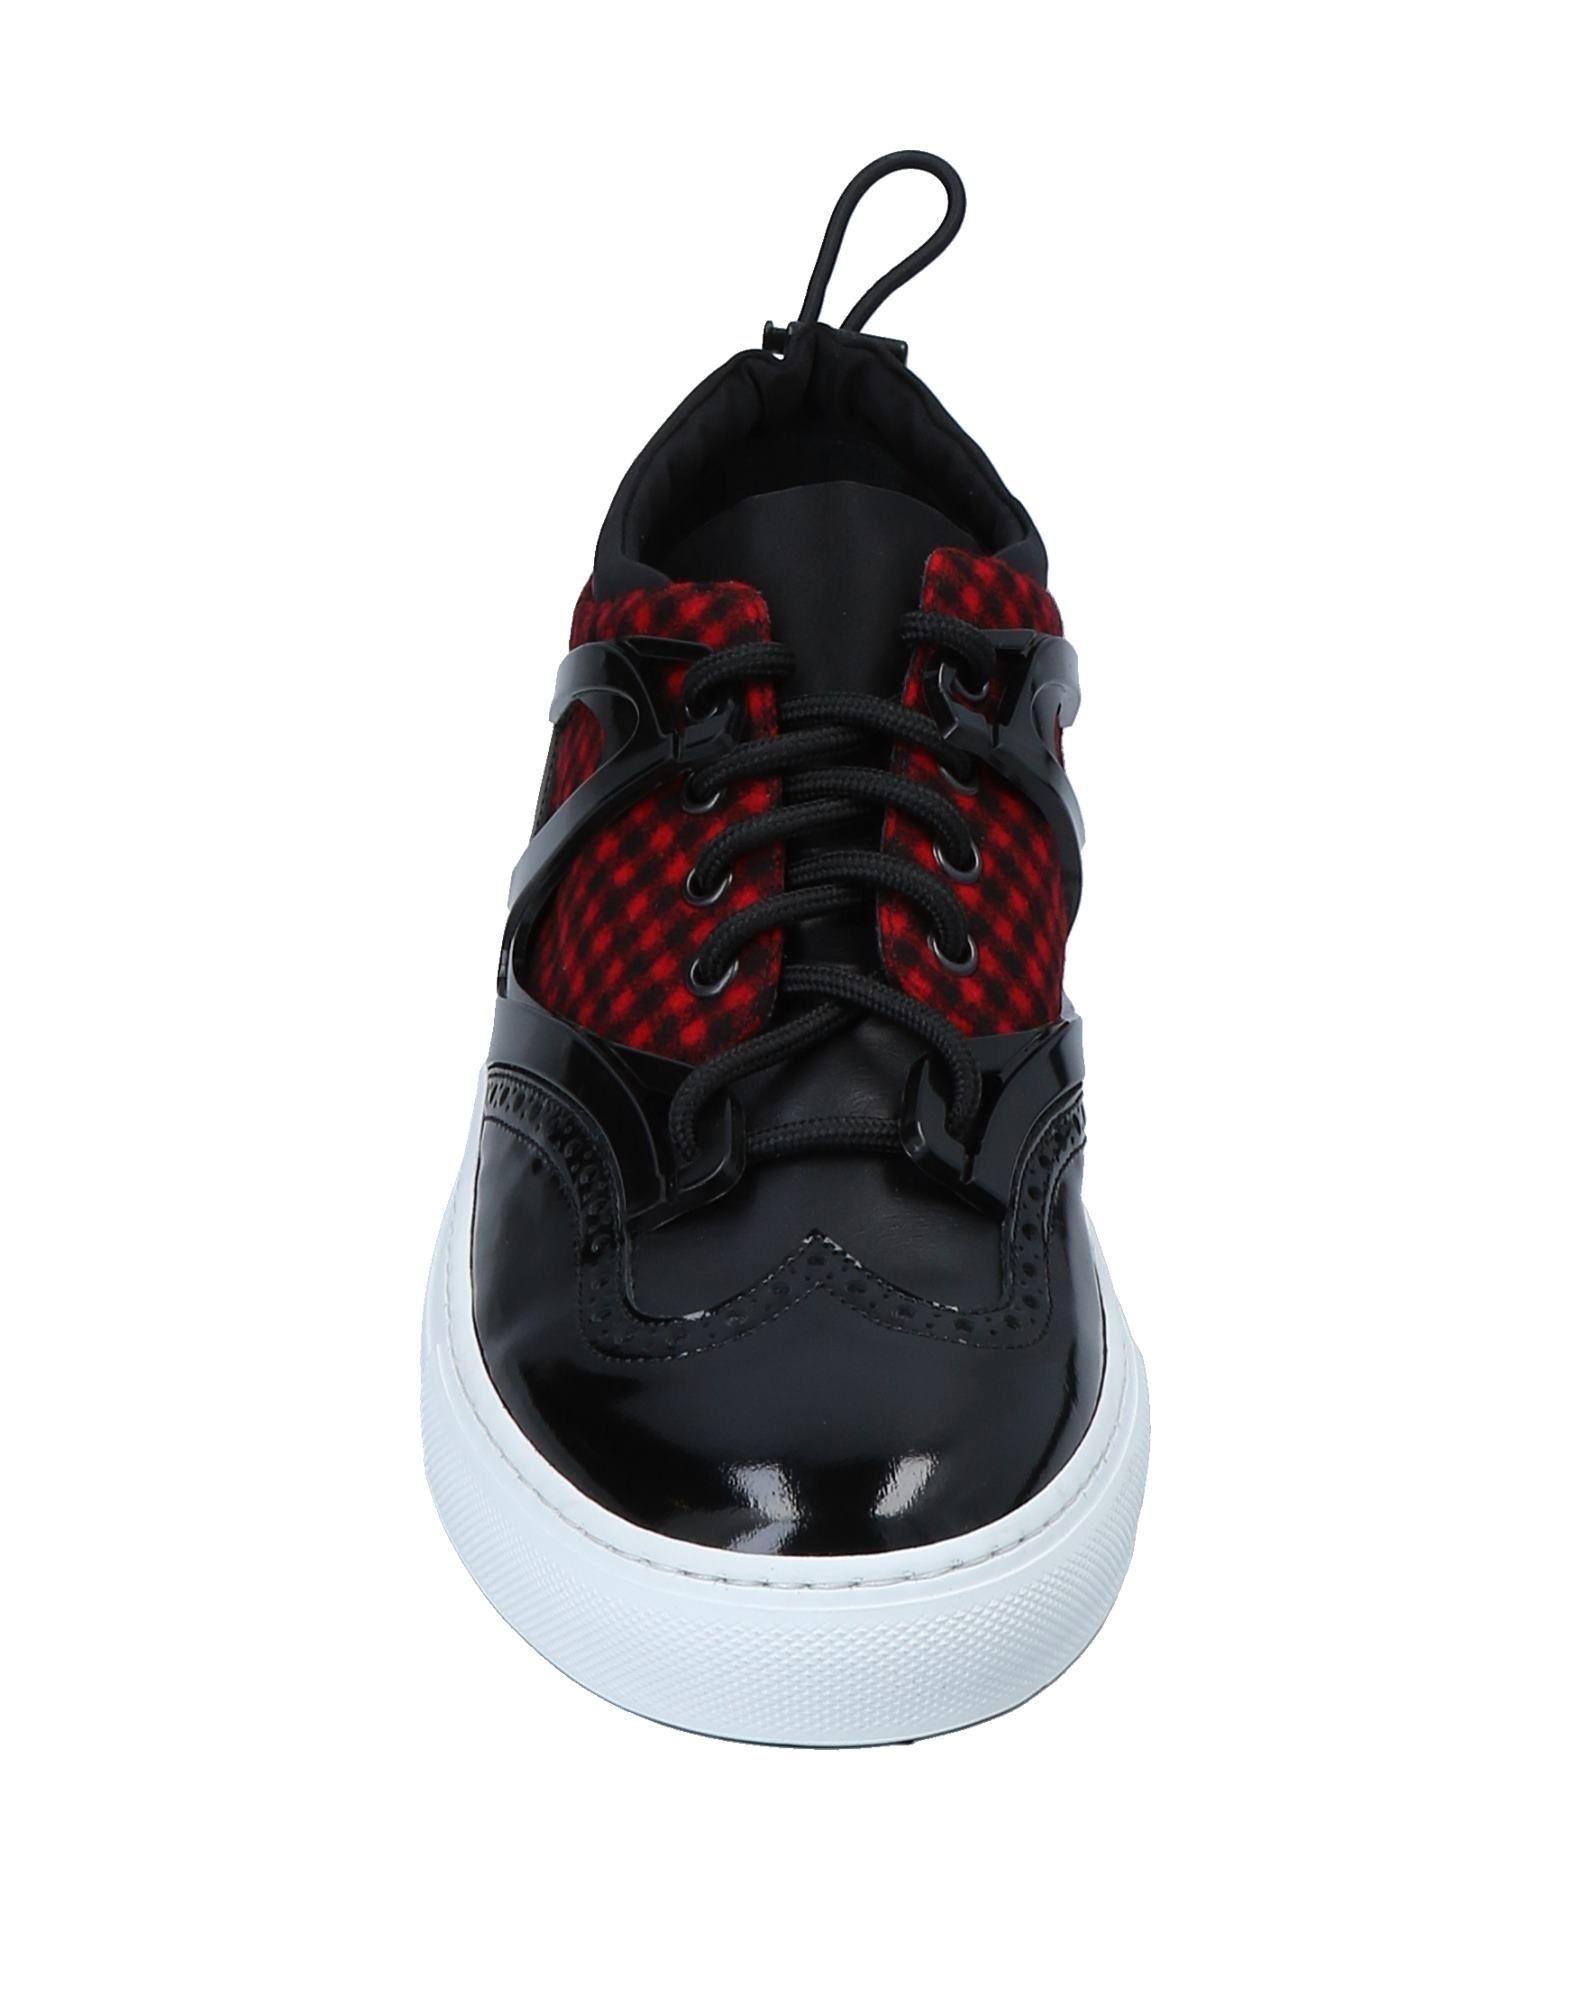 Dsquared2 Gute Sneakers Herren  11553844TX Gute Dsquared2 Qualität beliebte Schuhe 9fad0f